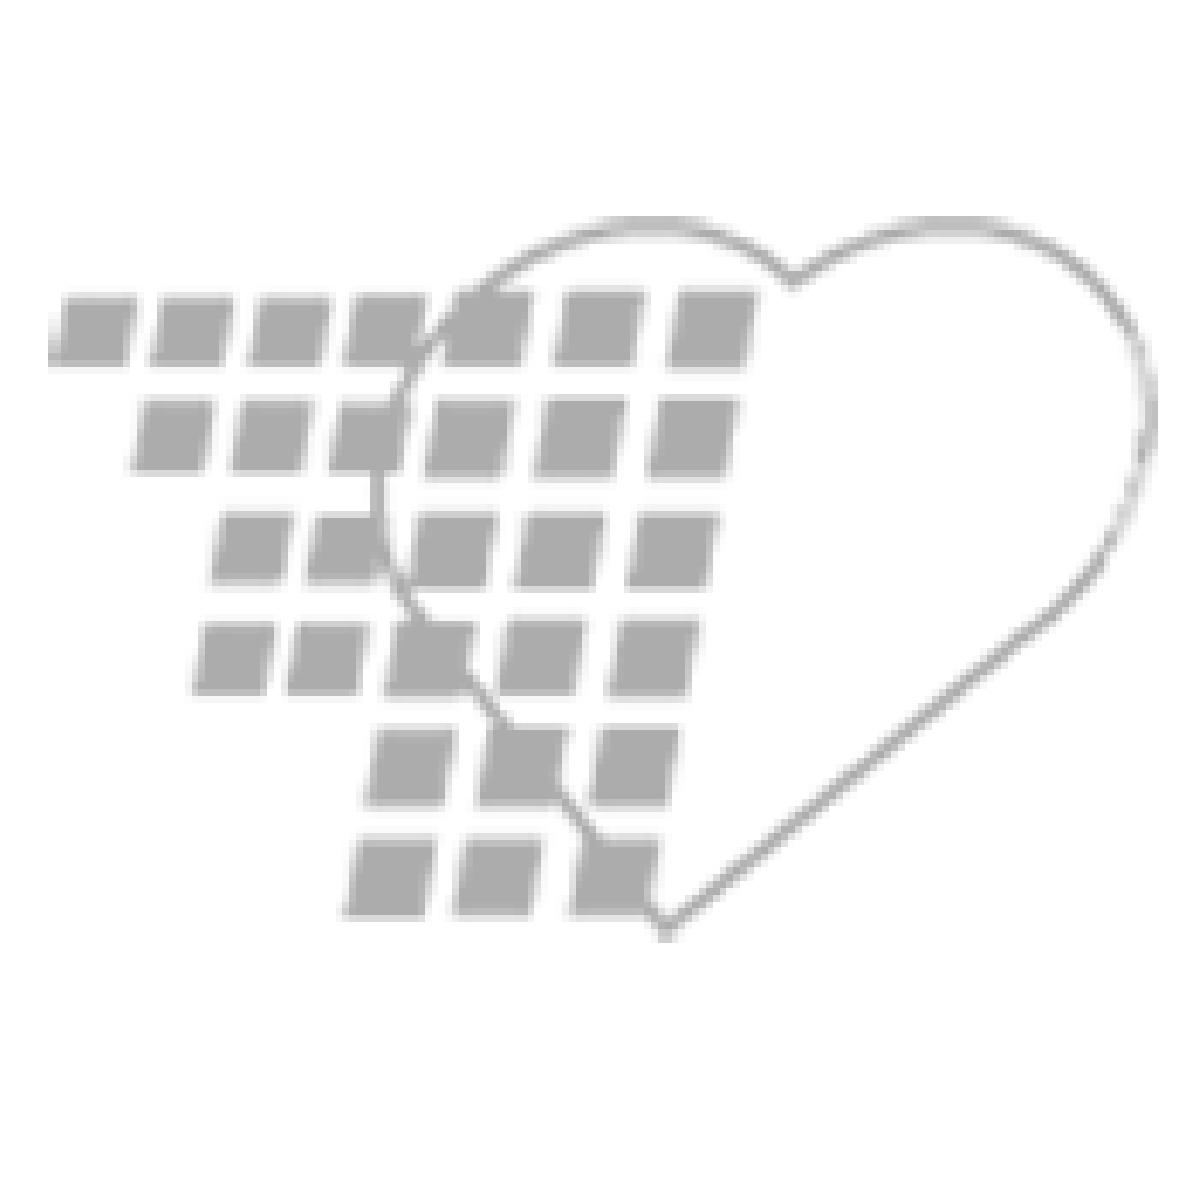 11-99-0144 Simulaids IV Bag for IV Hand/Arm 11-81-0146N/0147